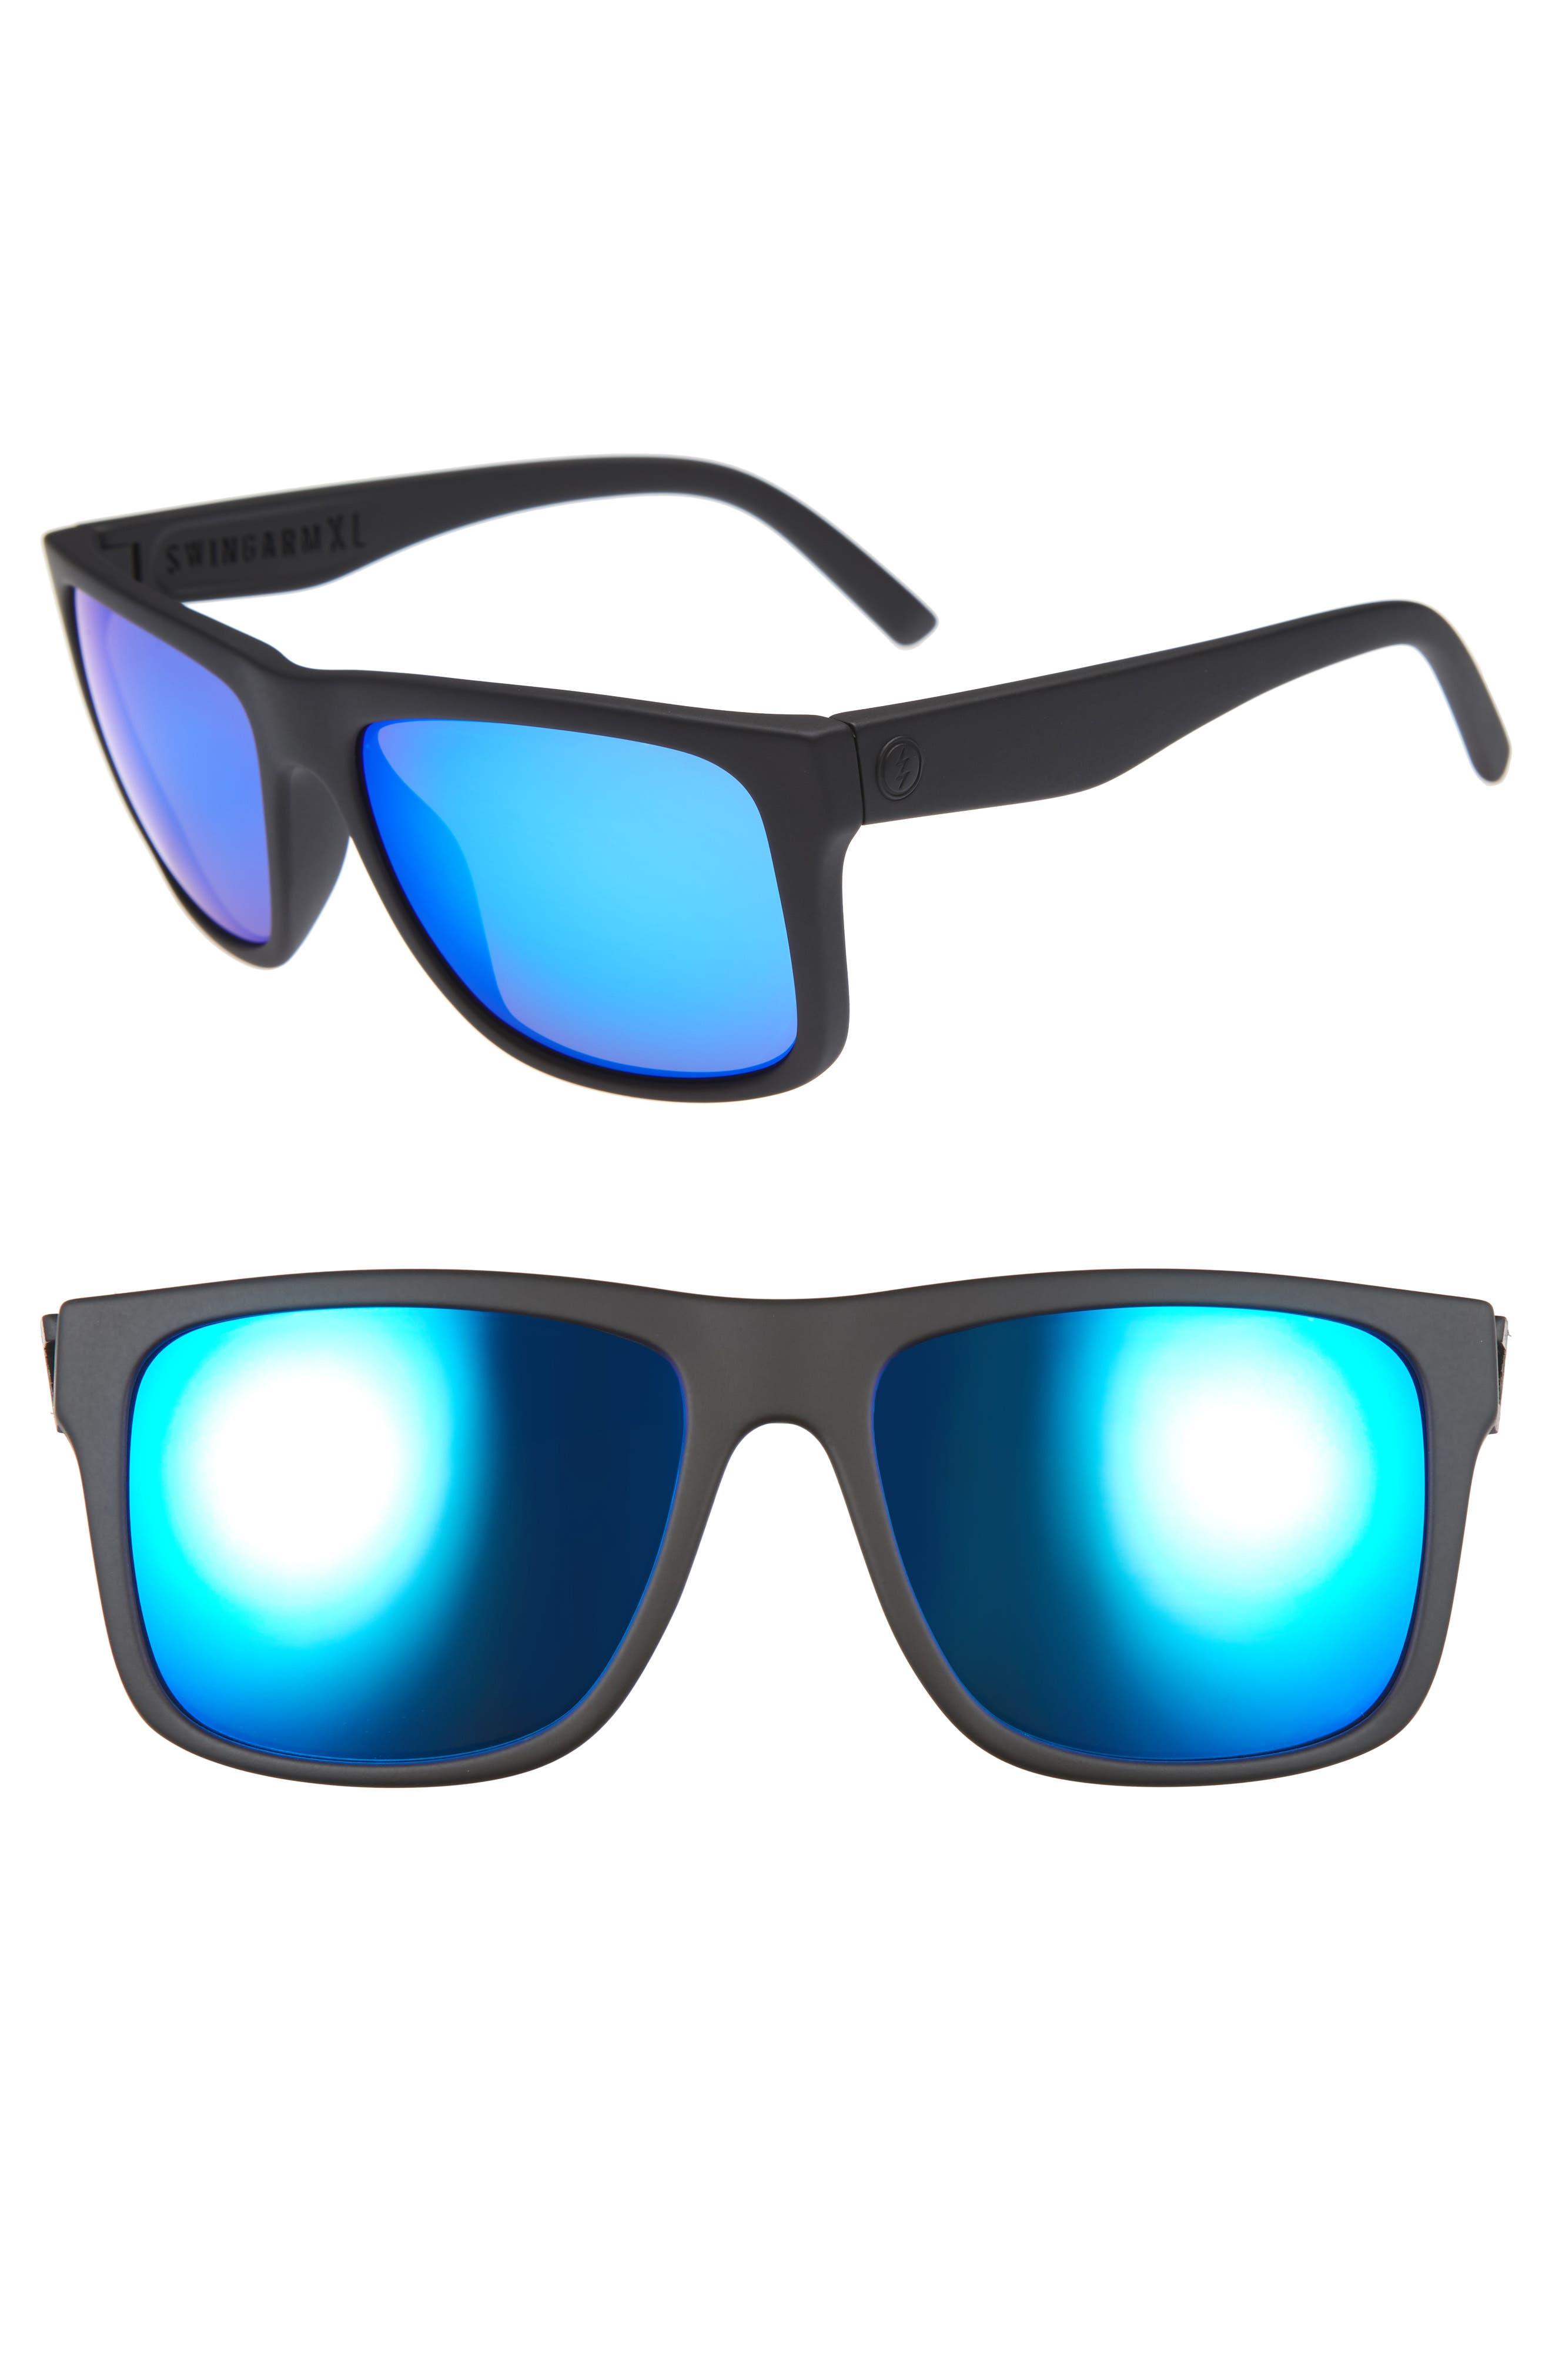 Main Image - ELECTRIC Swingarm XL 59mm Sunglasses